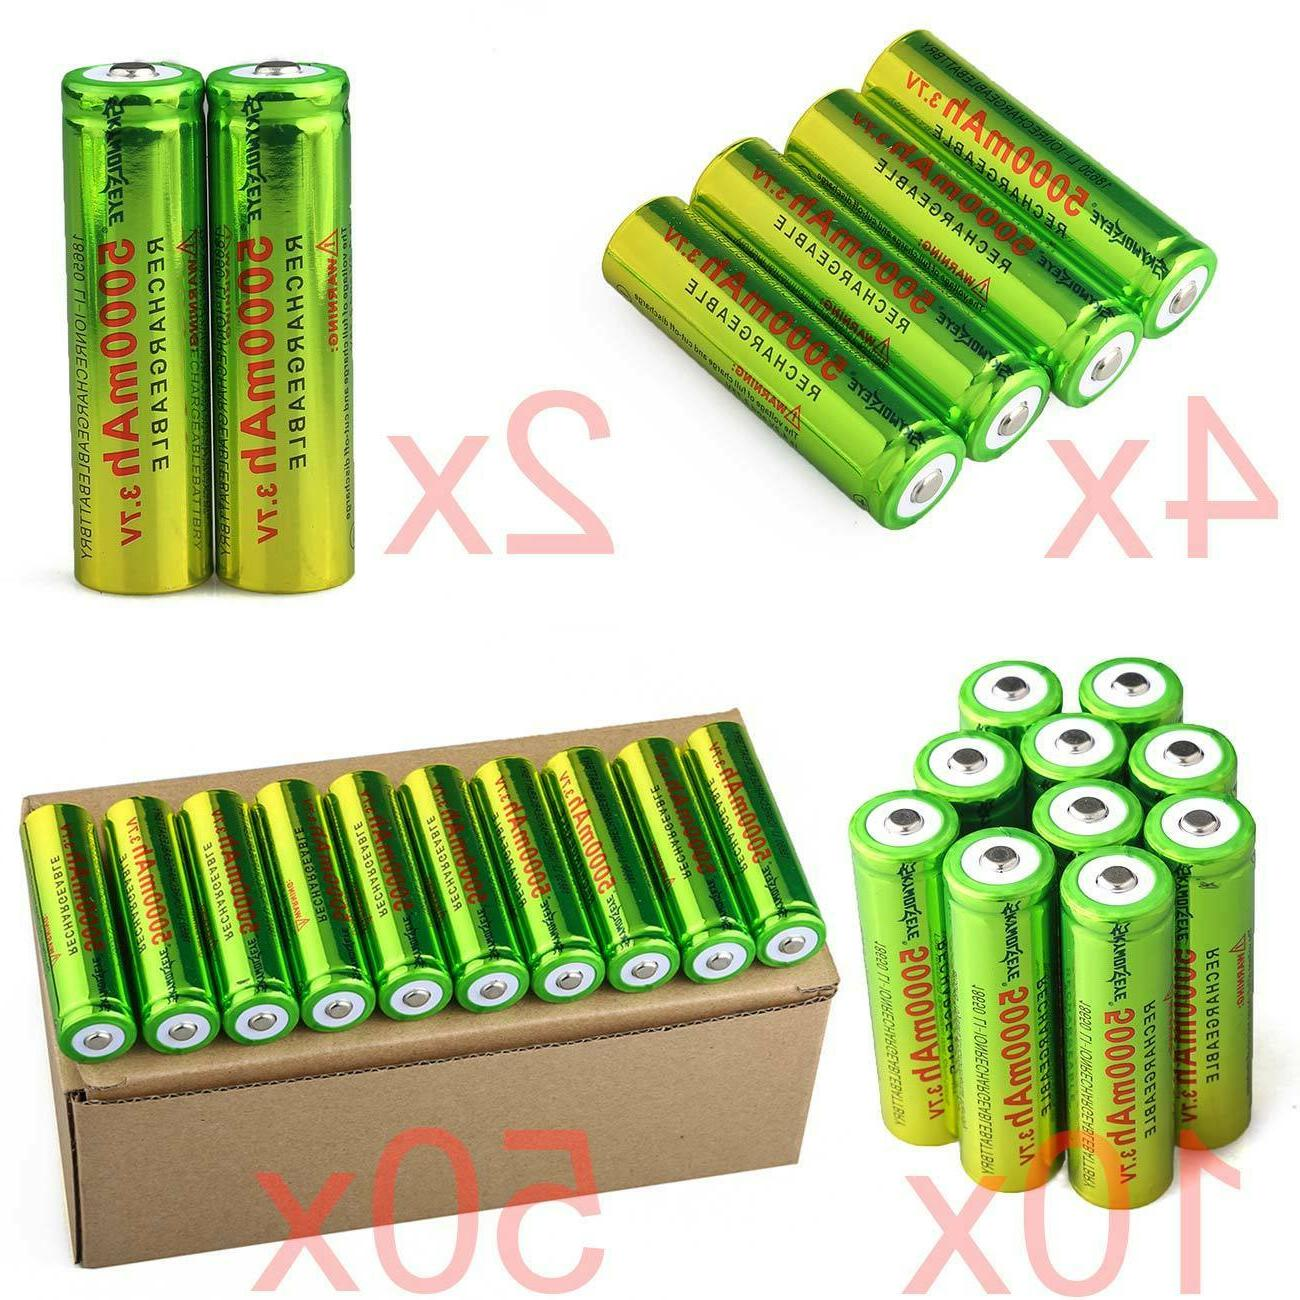 lot of skywolfeye 3 7v 18650 battery